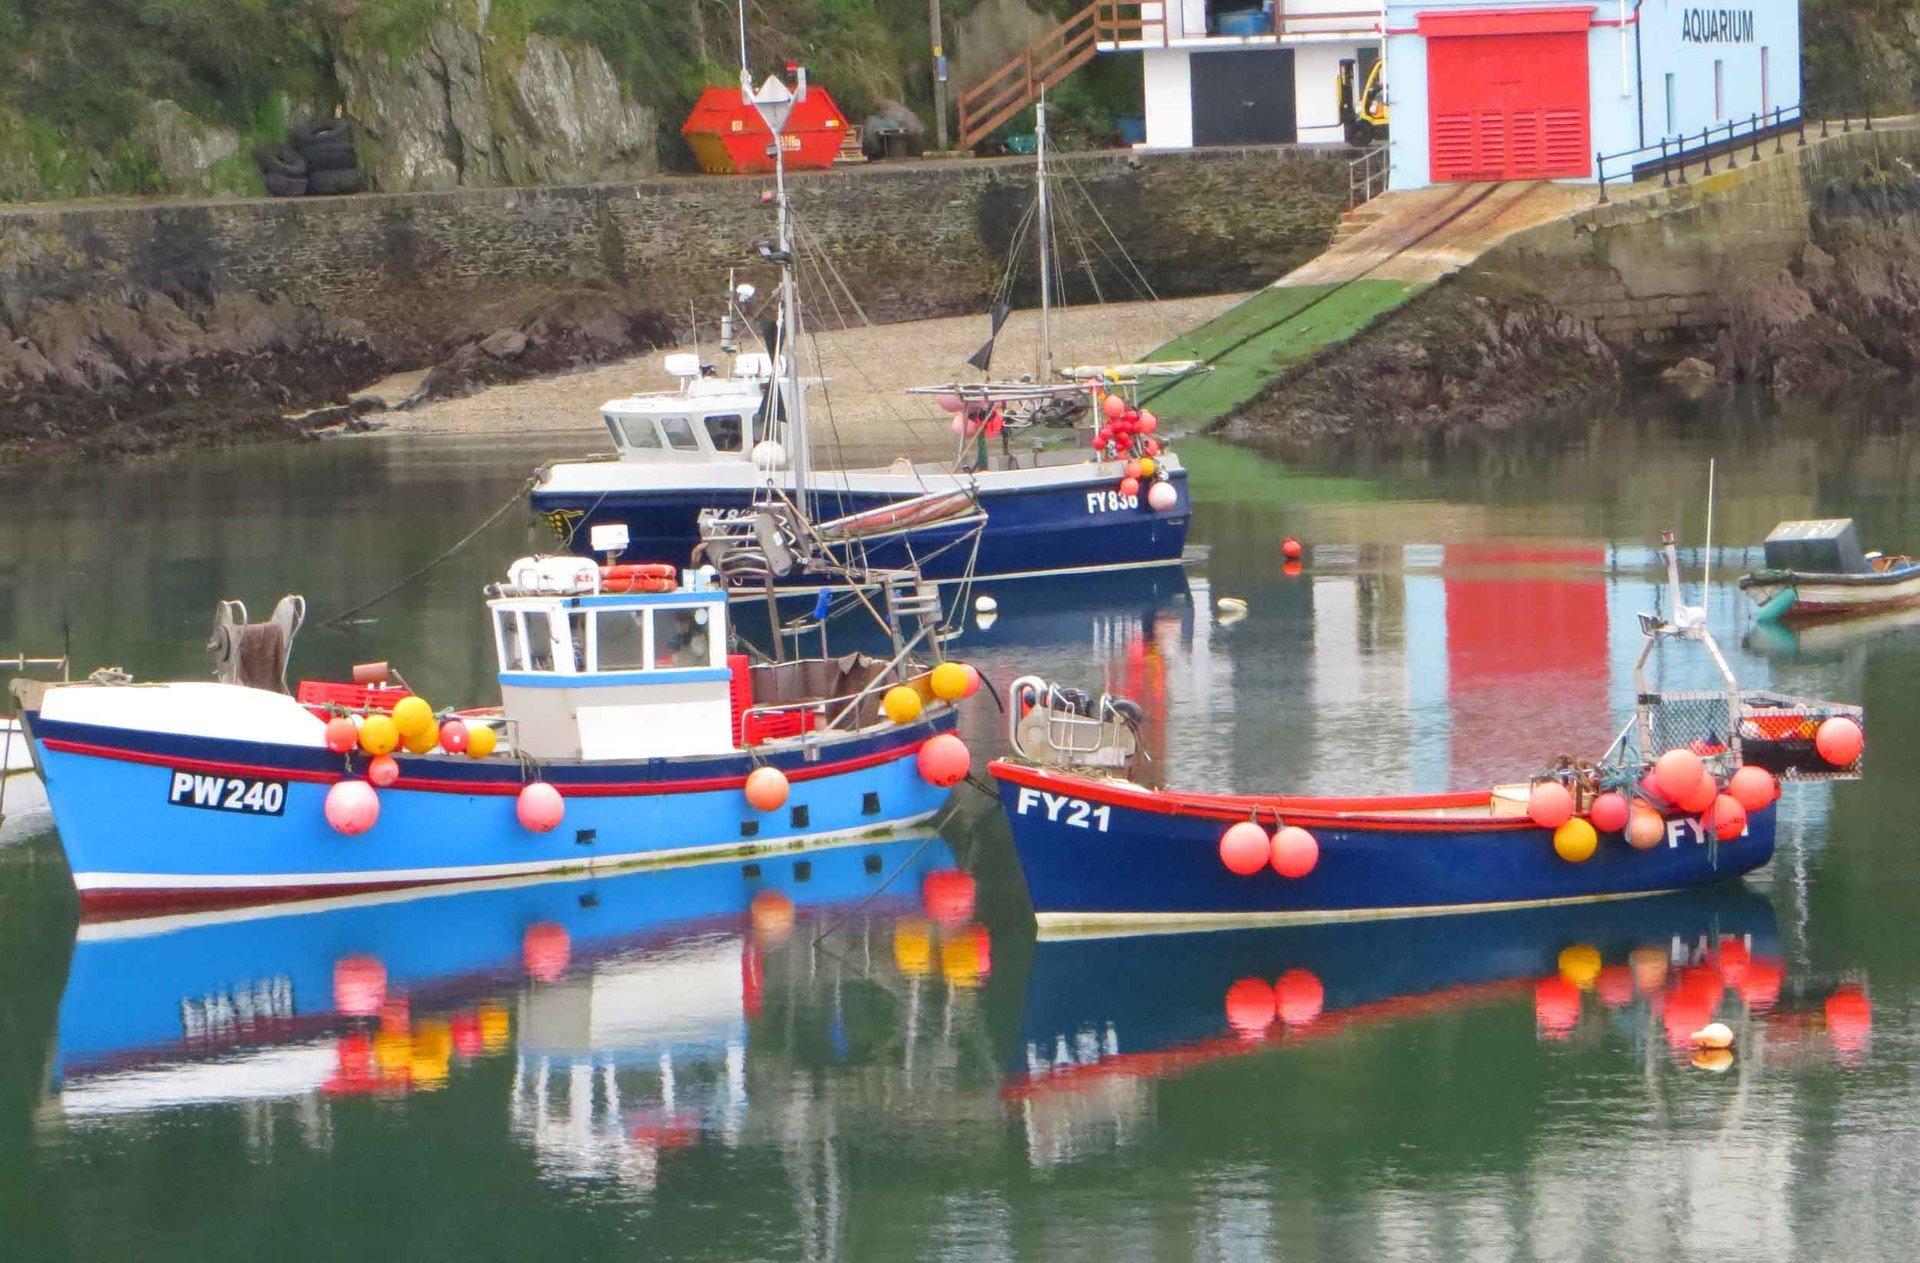 reflecting boats in Mevagissey harbour L A Kent Rogue Flamingo D I Treloar series